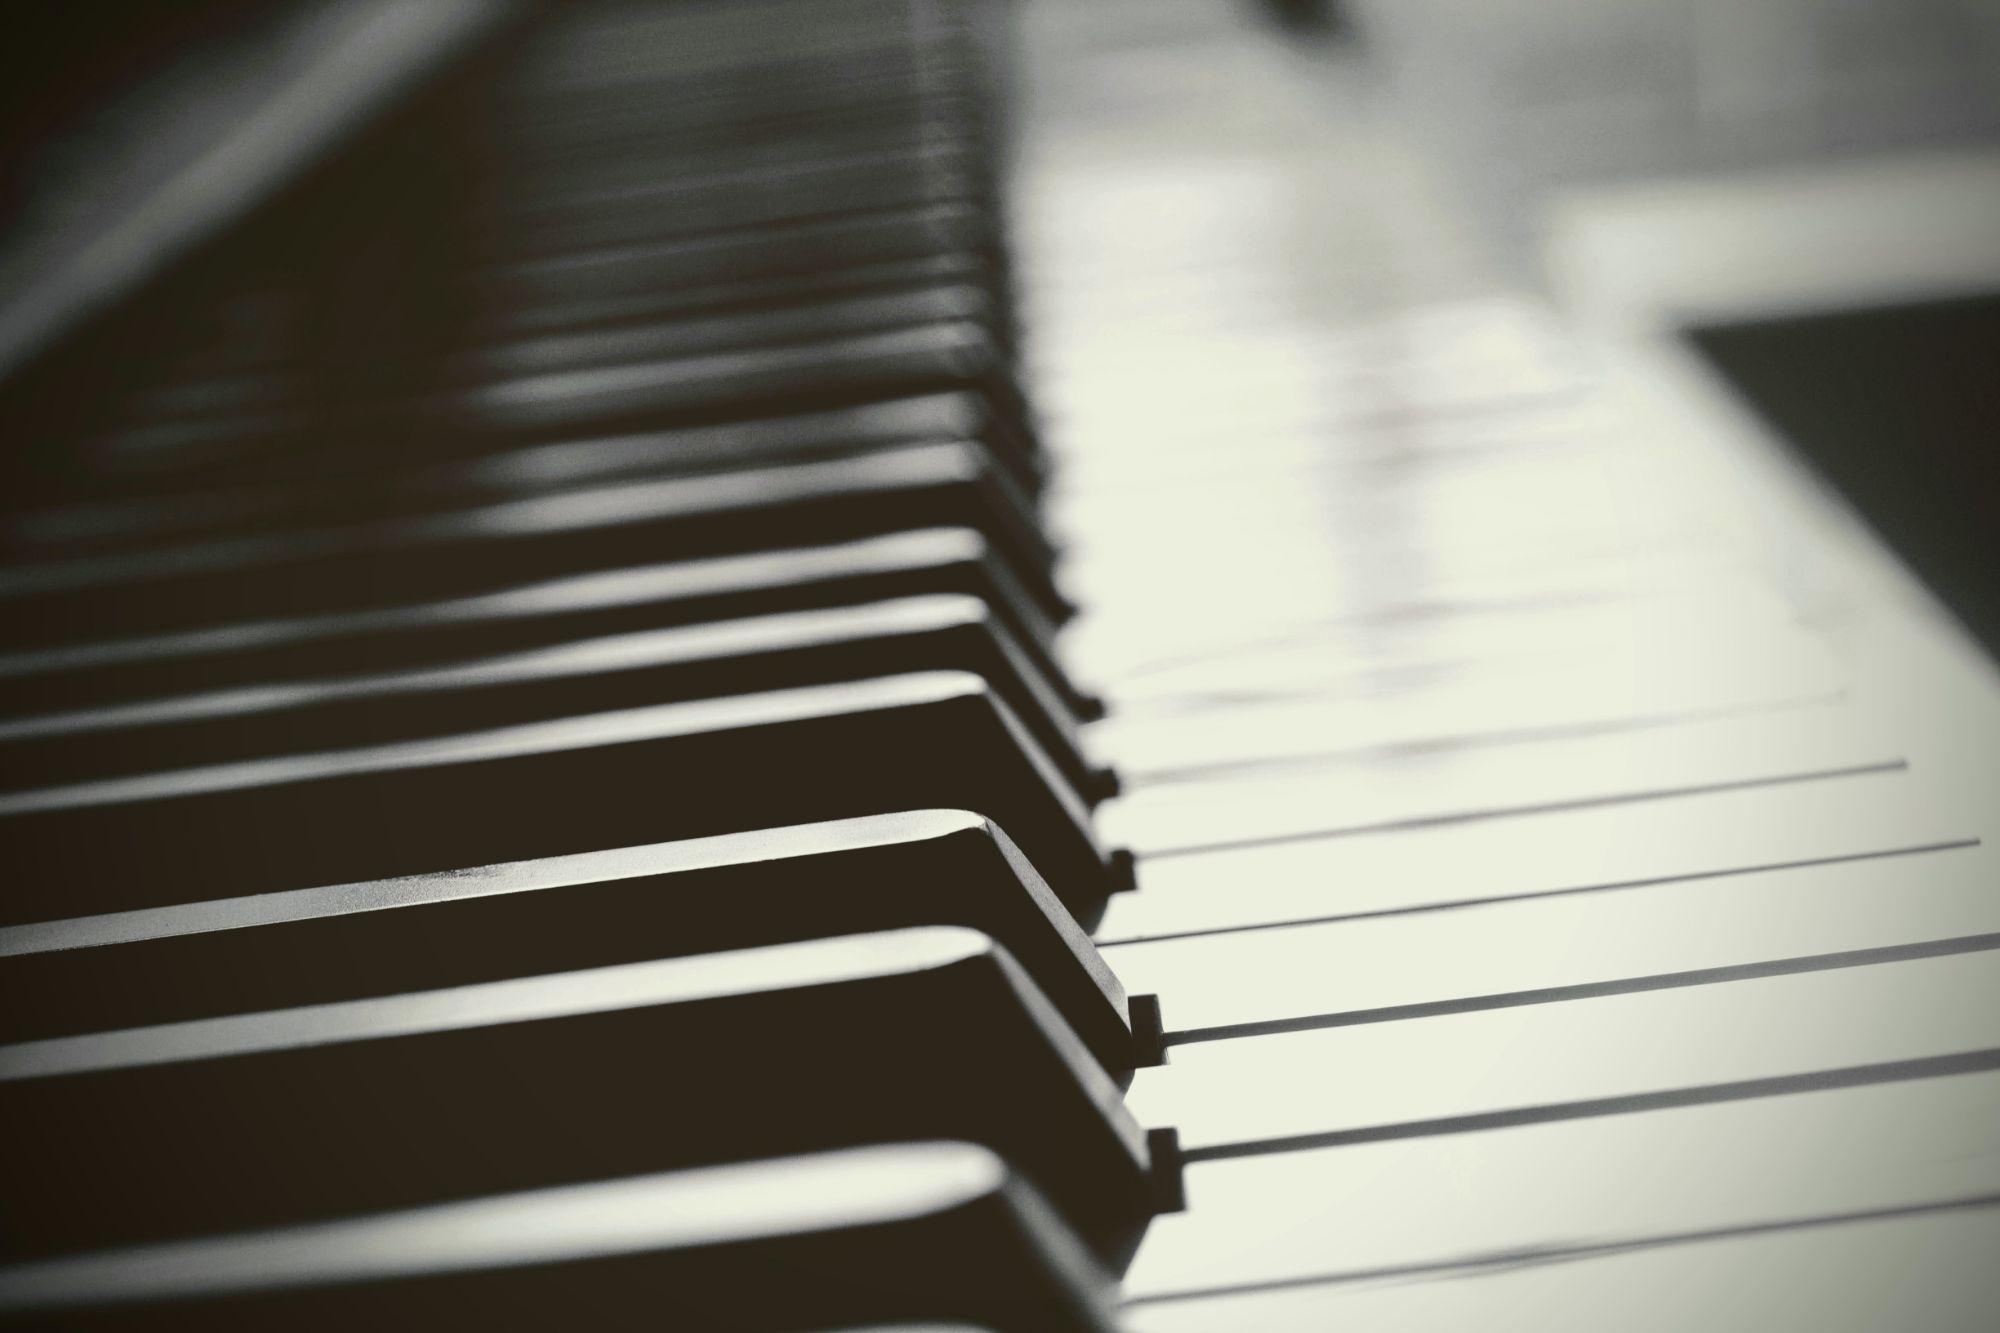 klaveri klahvid